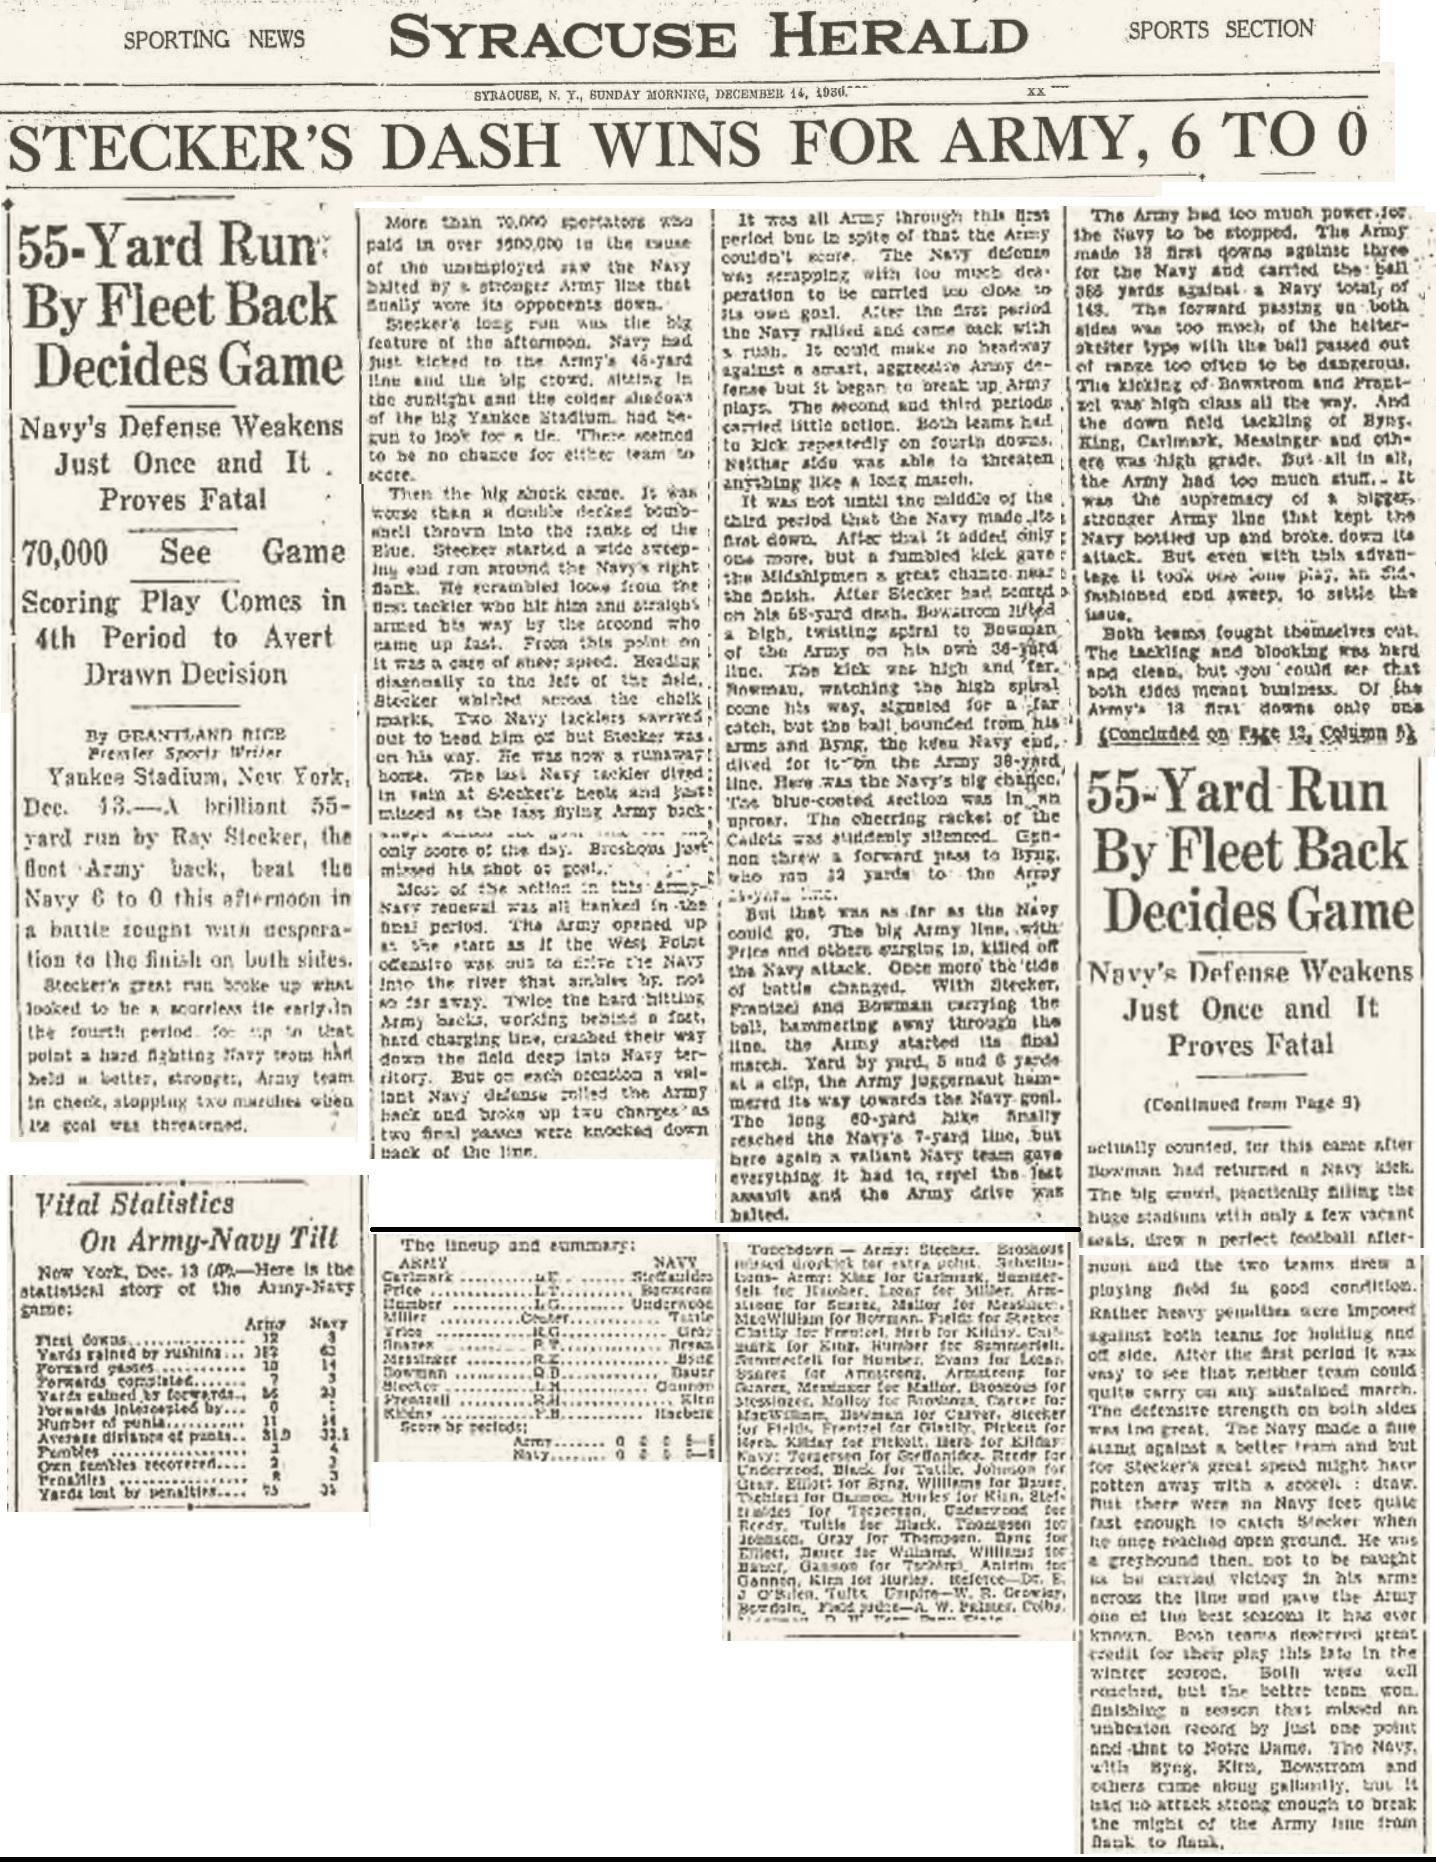 ArmyFB_1930_vsNavy_SyracuseHerald_Dec141930